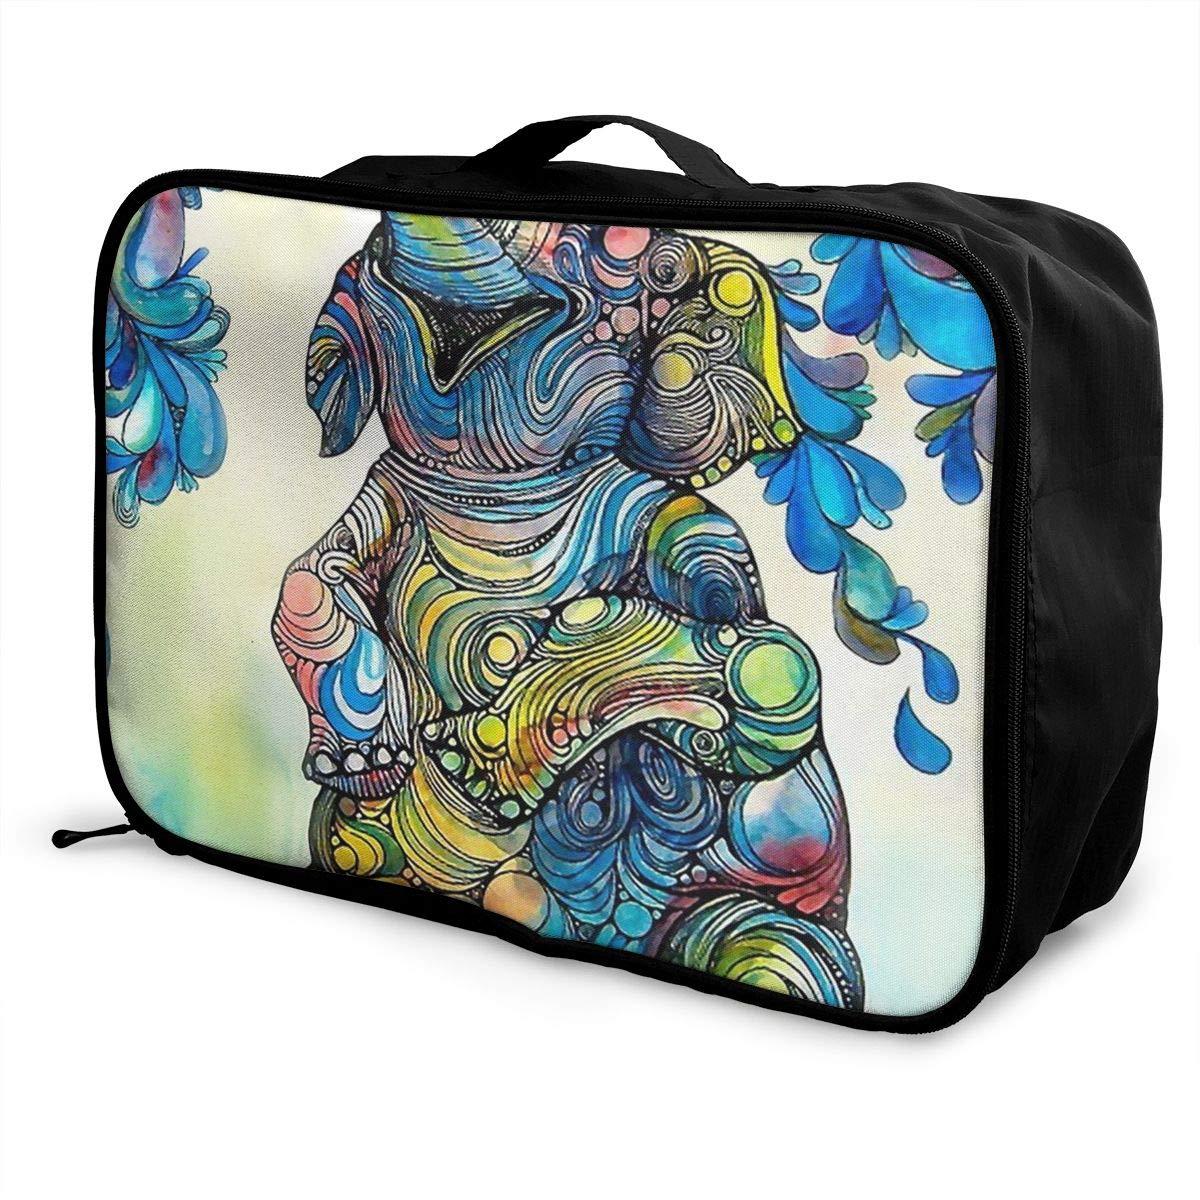 ADGAI Elephant Coloful Canvas Travel Weekender Bag,Fashion Custom Lightweight Large Capacity Portable Luggage Bag,Suitcase Trolley Bag